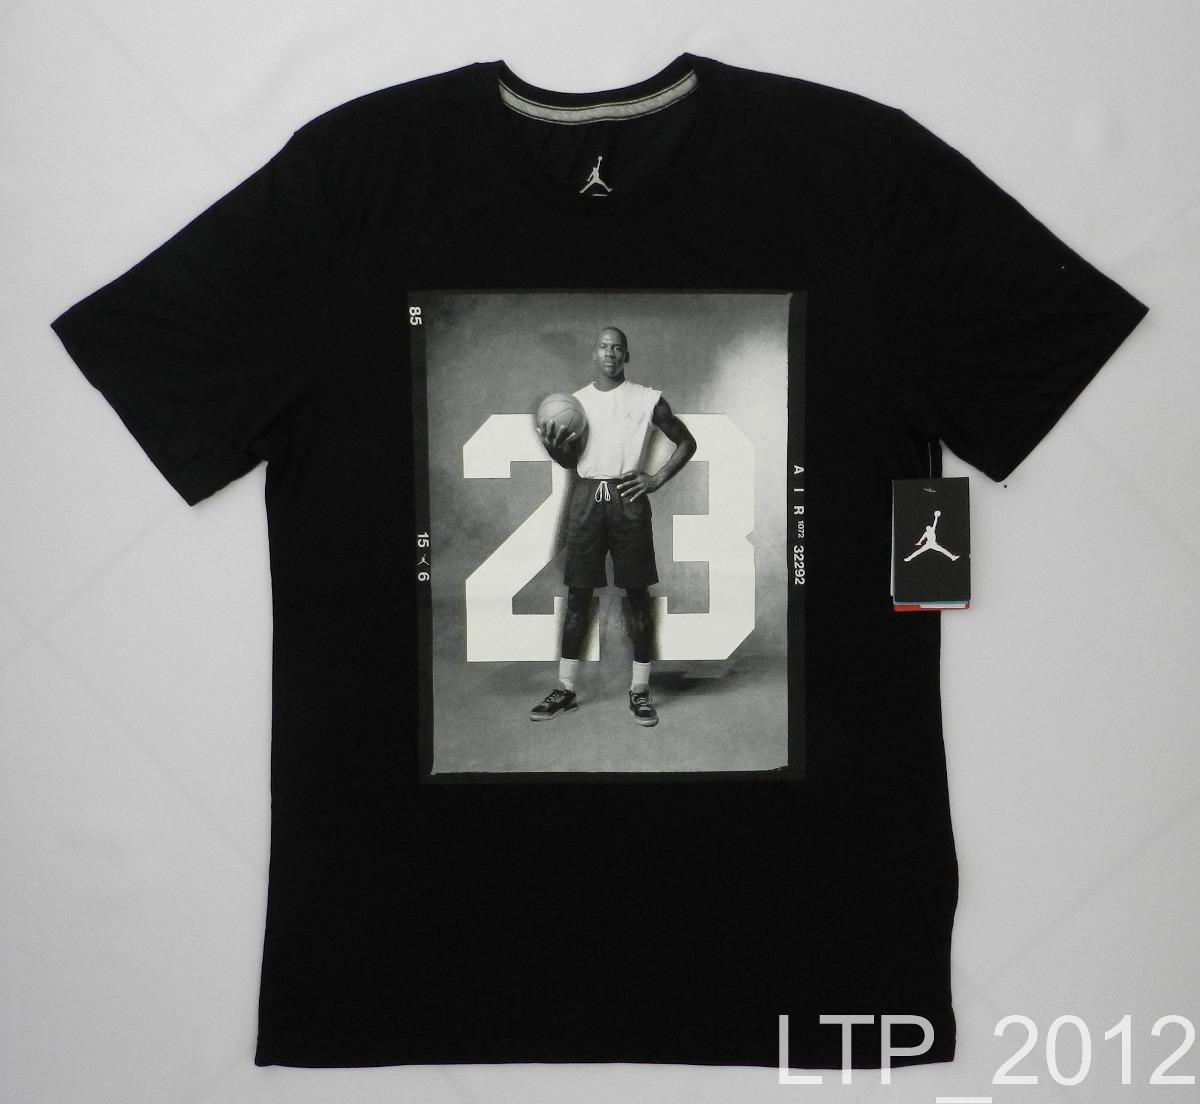 1a4109931e2d6 Camiseta Nike Dri-fit Basquete Michael Jordan - Tamanho M - R  89